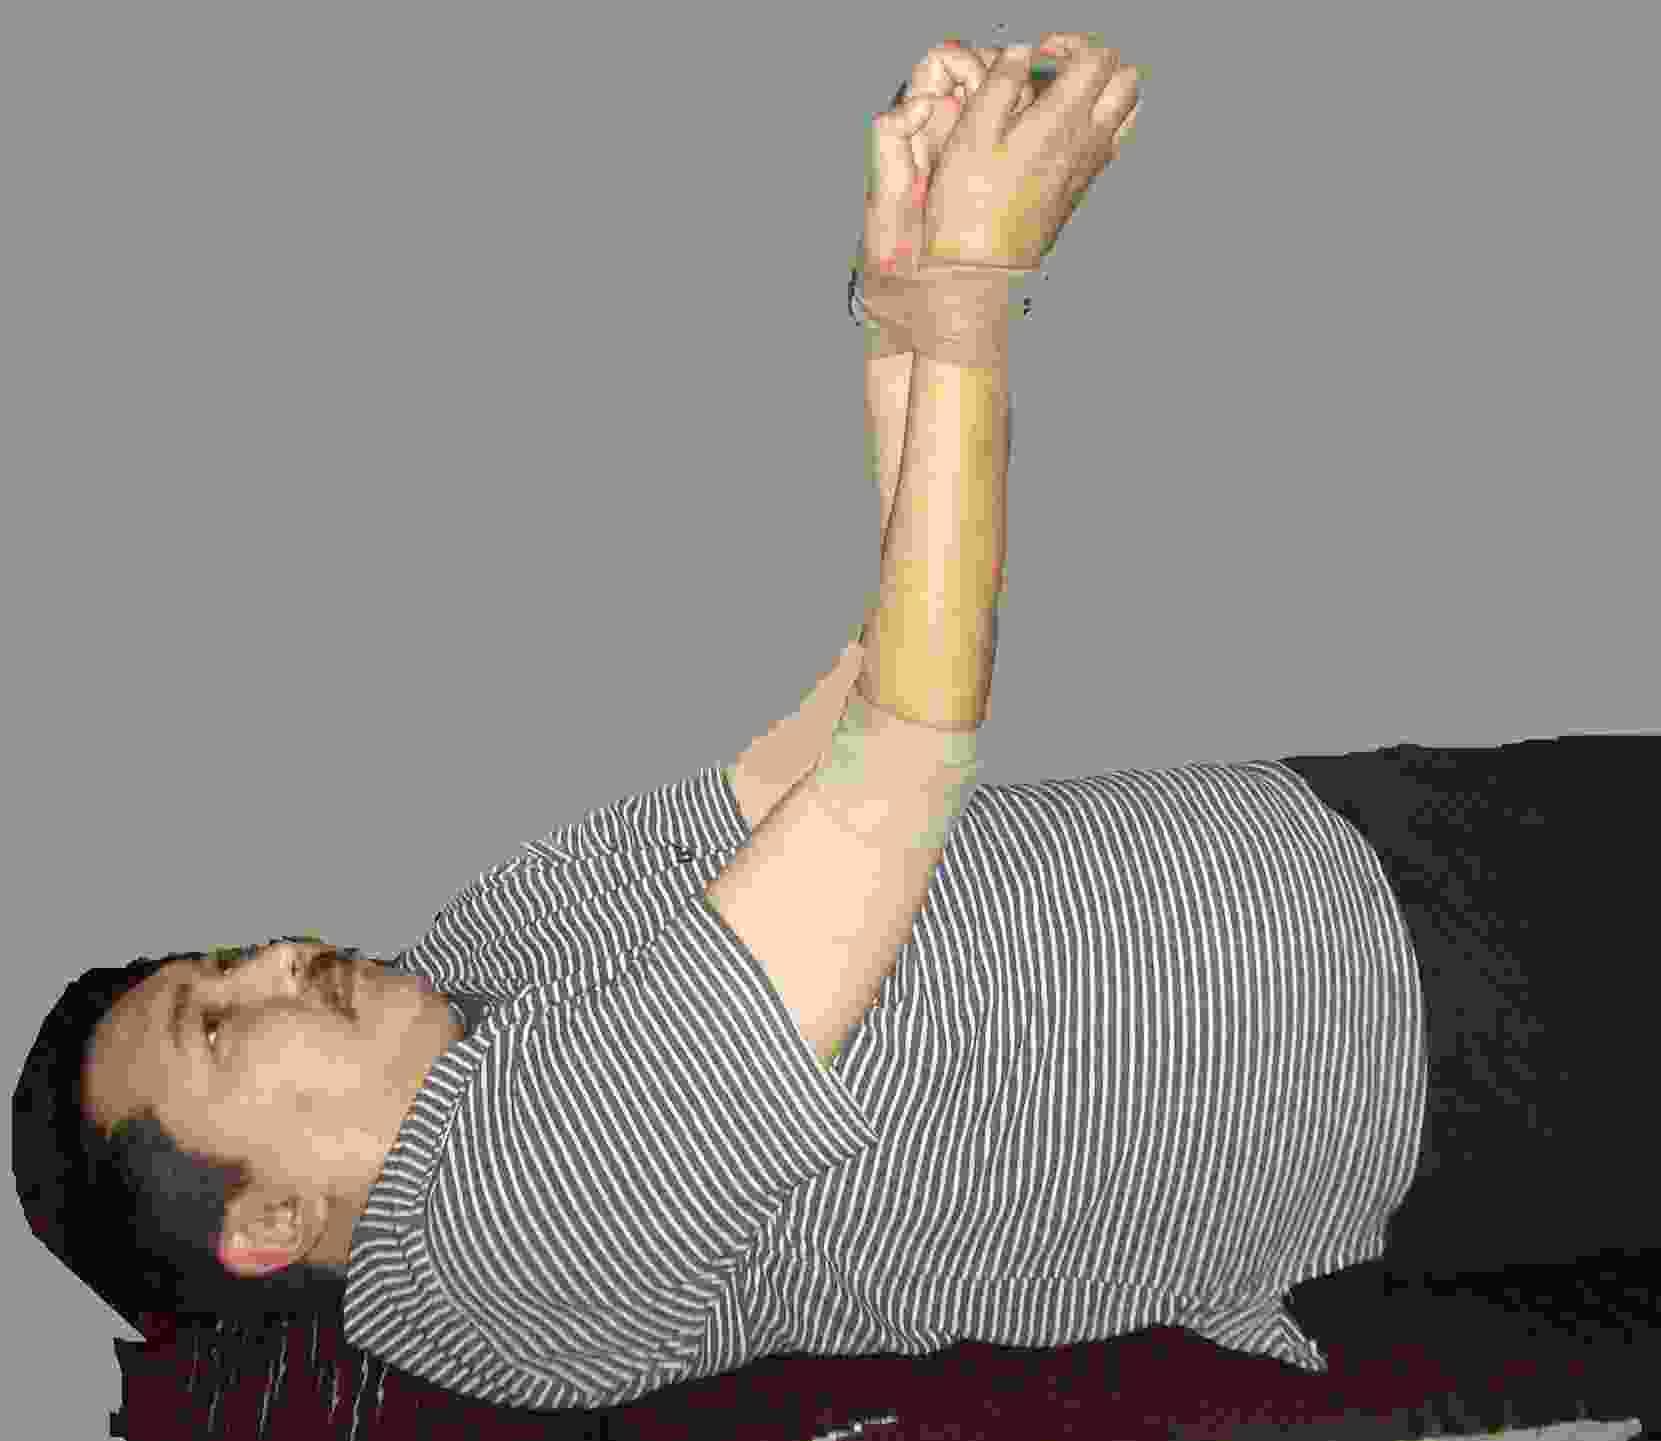 Сонник руки во сне, к чему снятся руки. Толкование 99